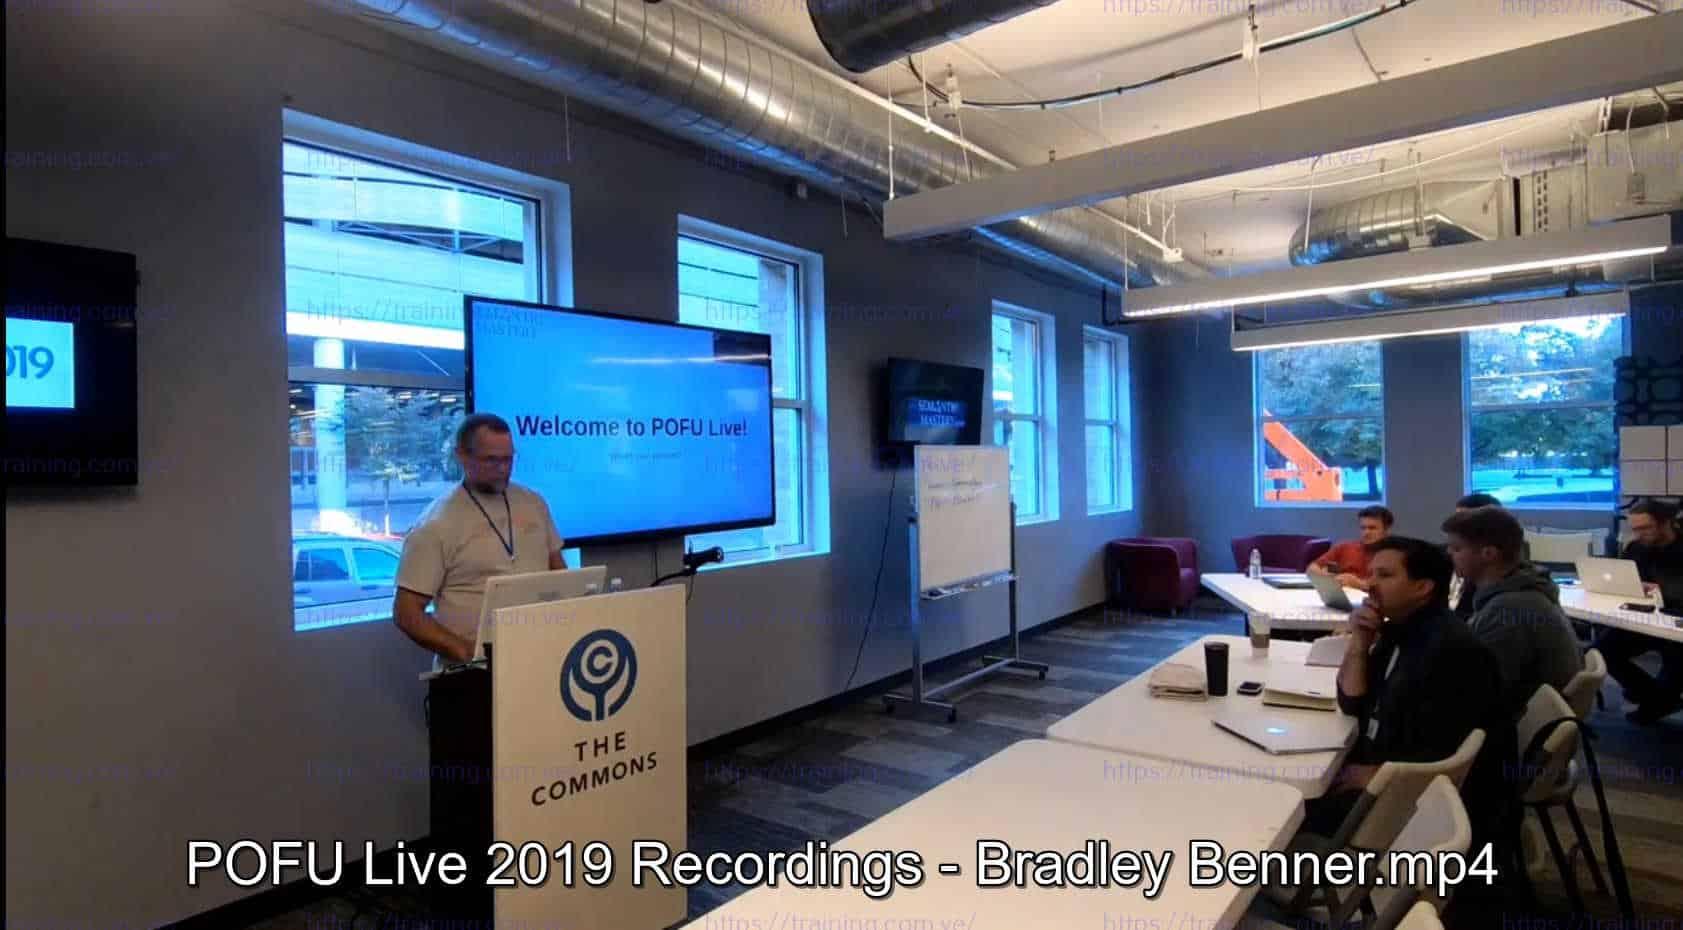 POFU Live 2019 Recordings Discount